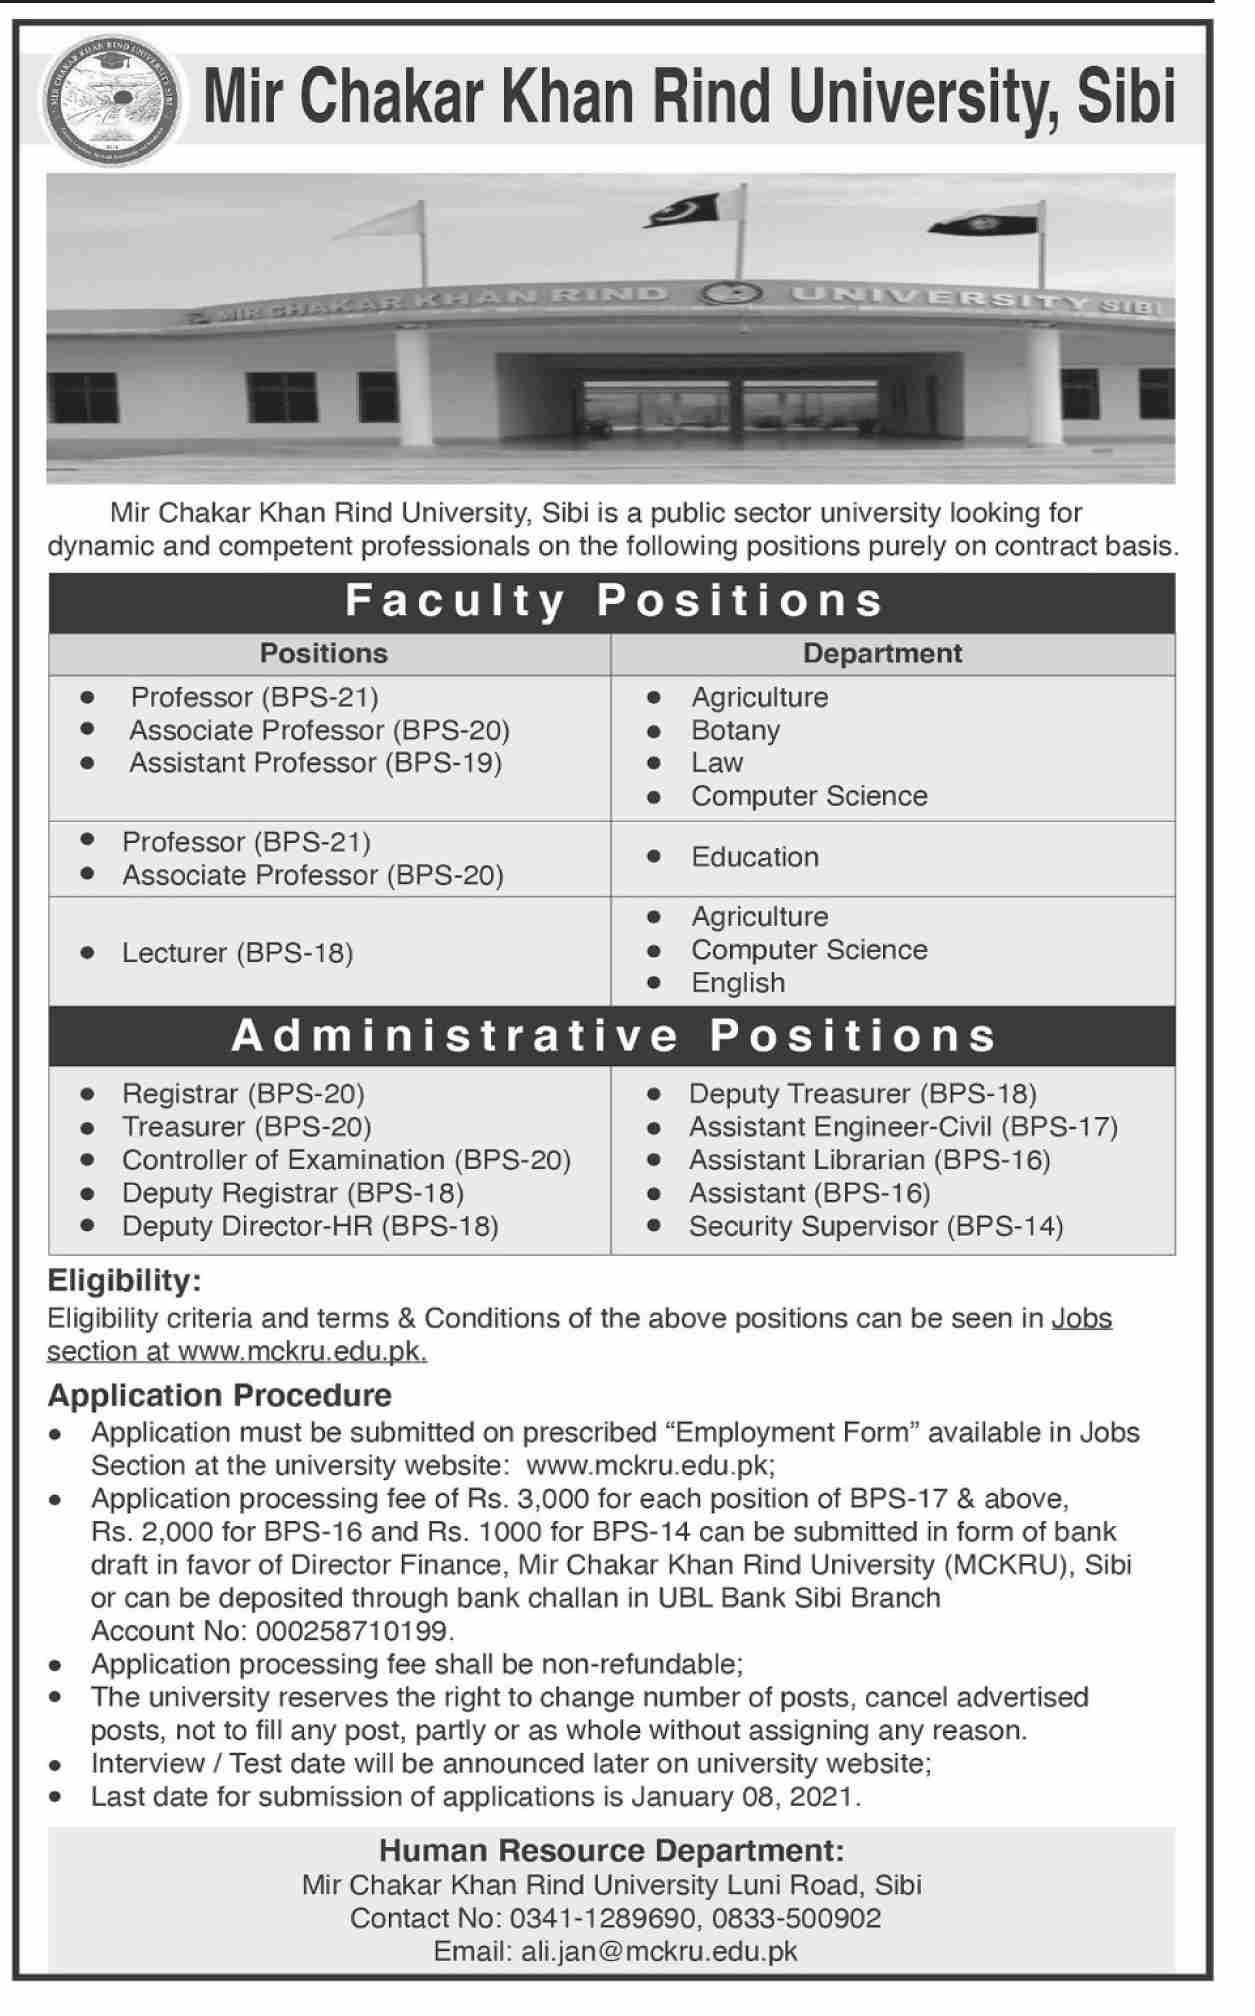 Mir Chakar Khan Rind University of Technology Jobs 2021 Application Form Eligibility Criteria